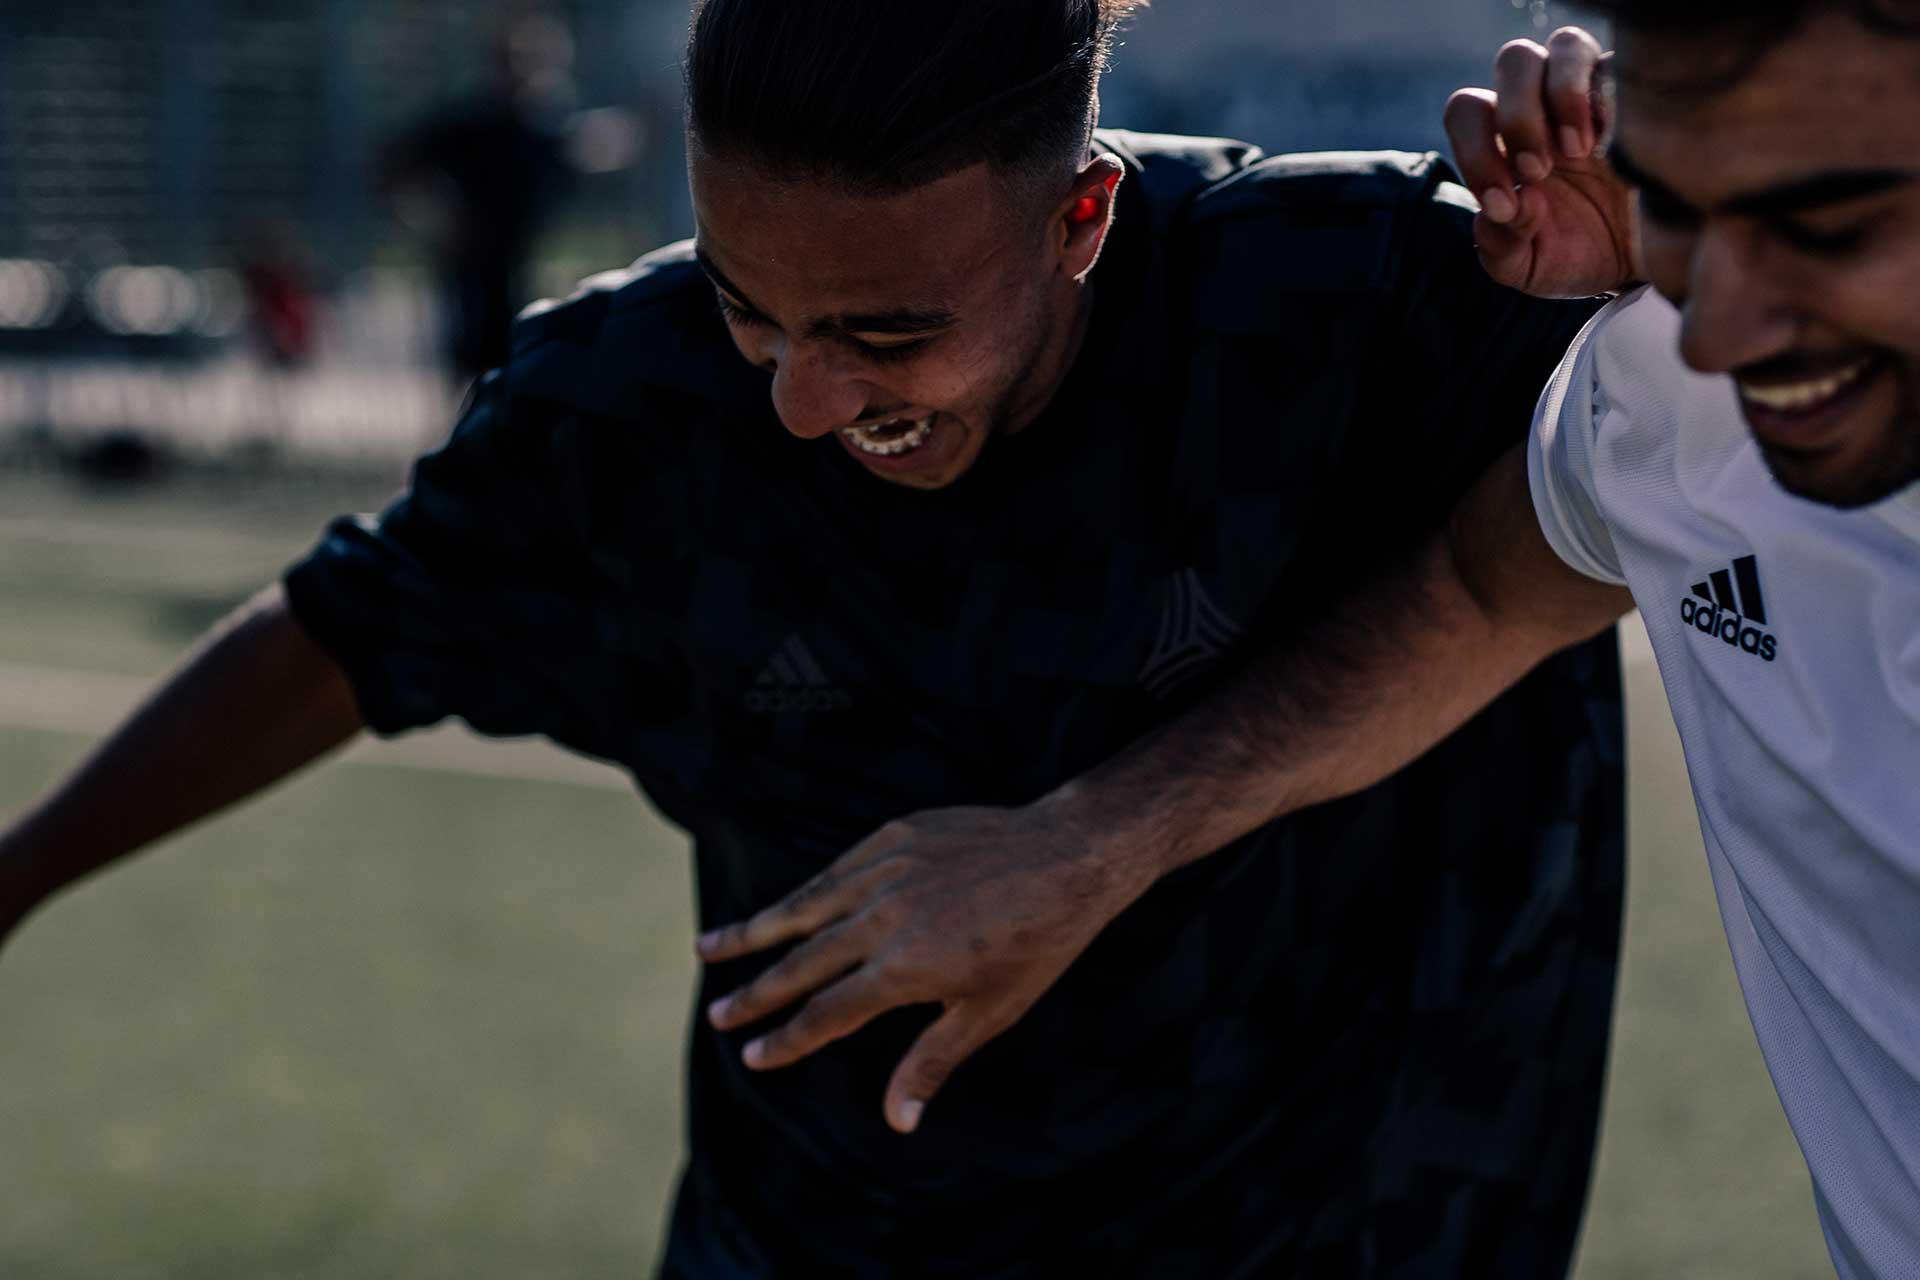 Adidas Powerbar Fußball Fotoproduktion Teamsport Michael Müller Fotograf London